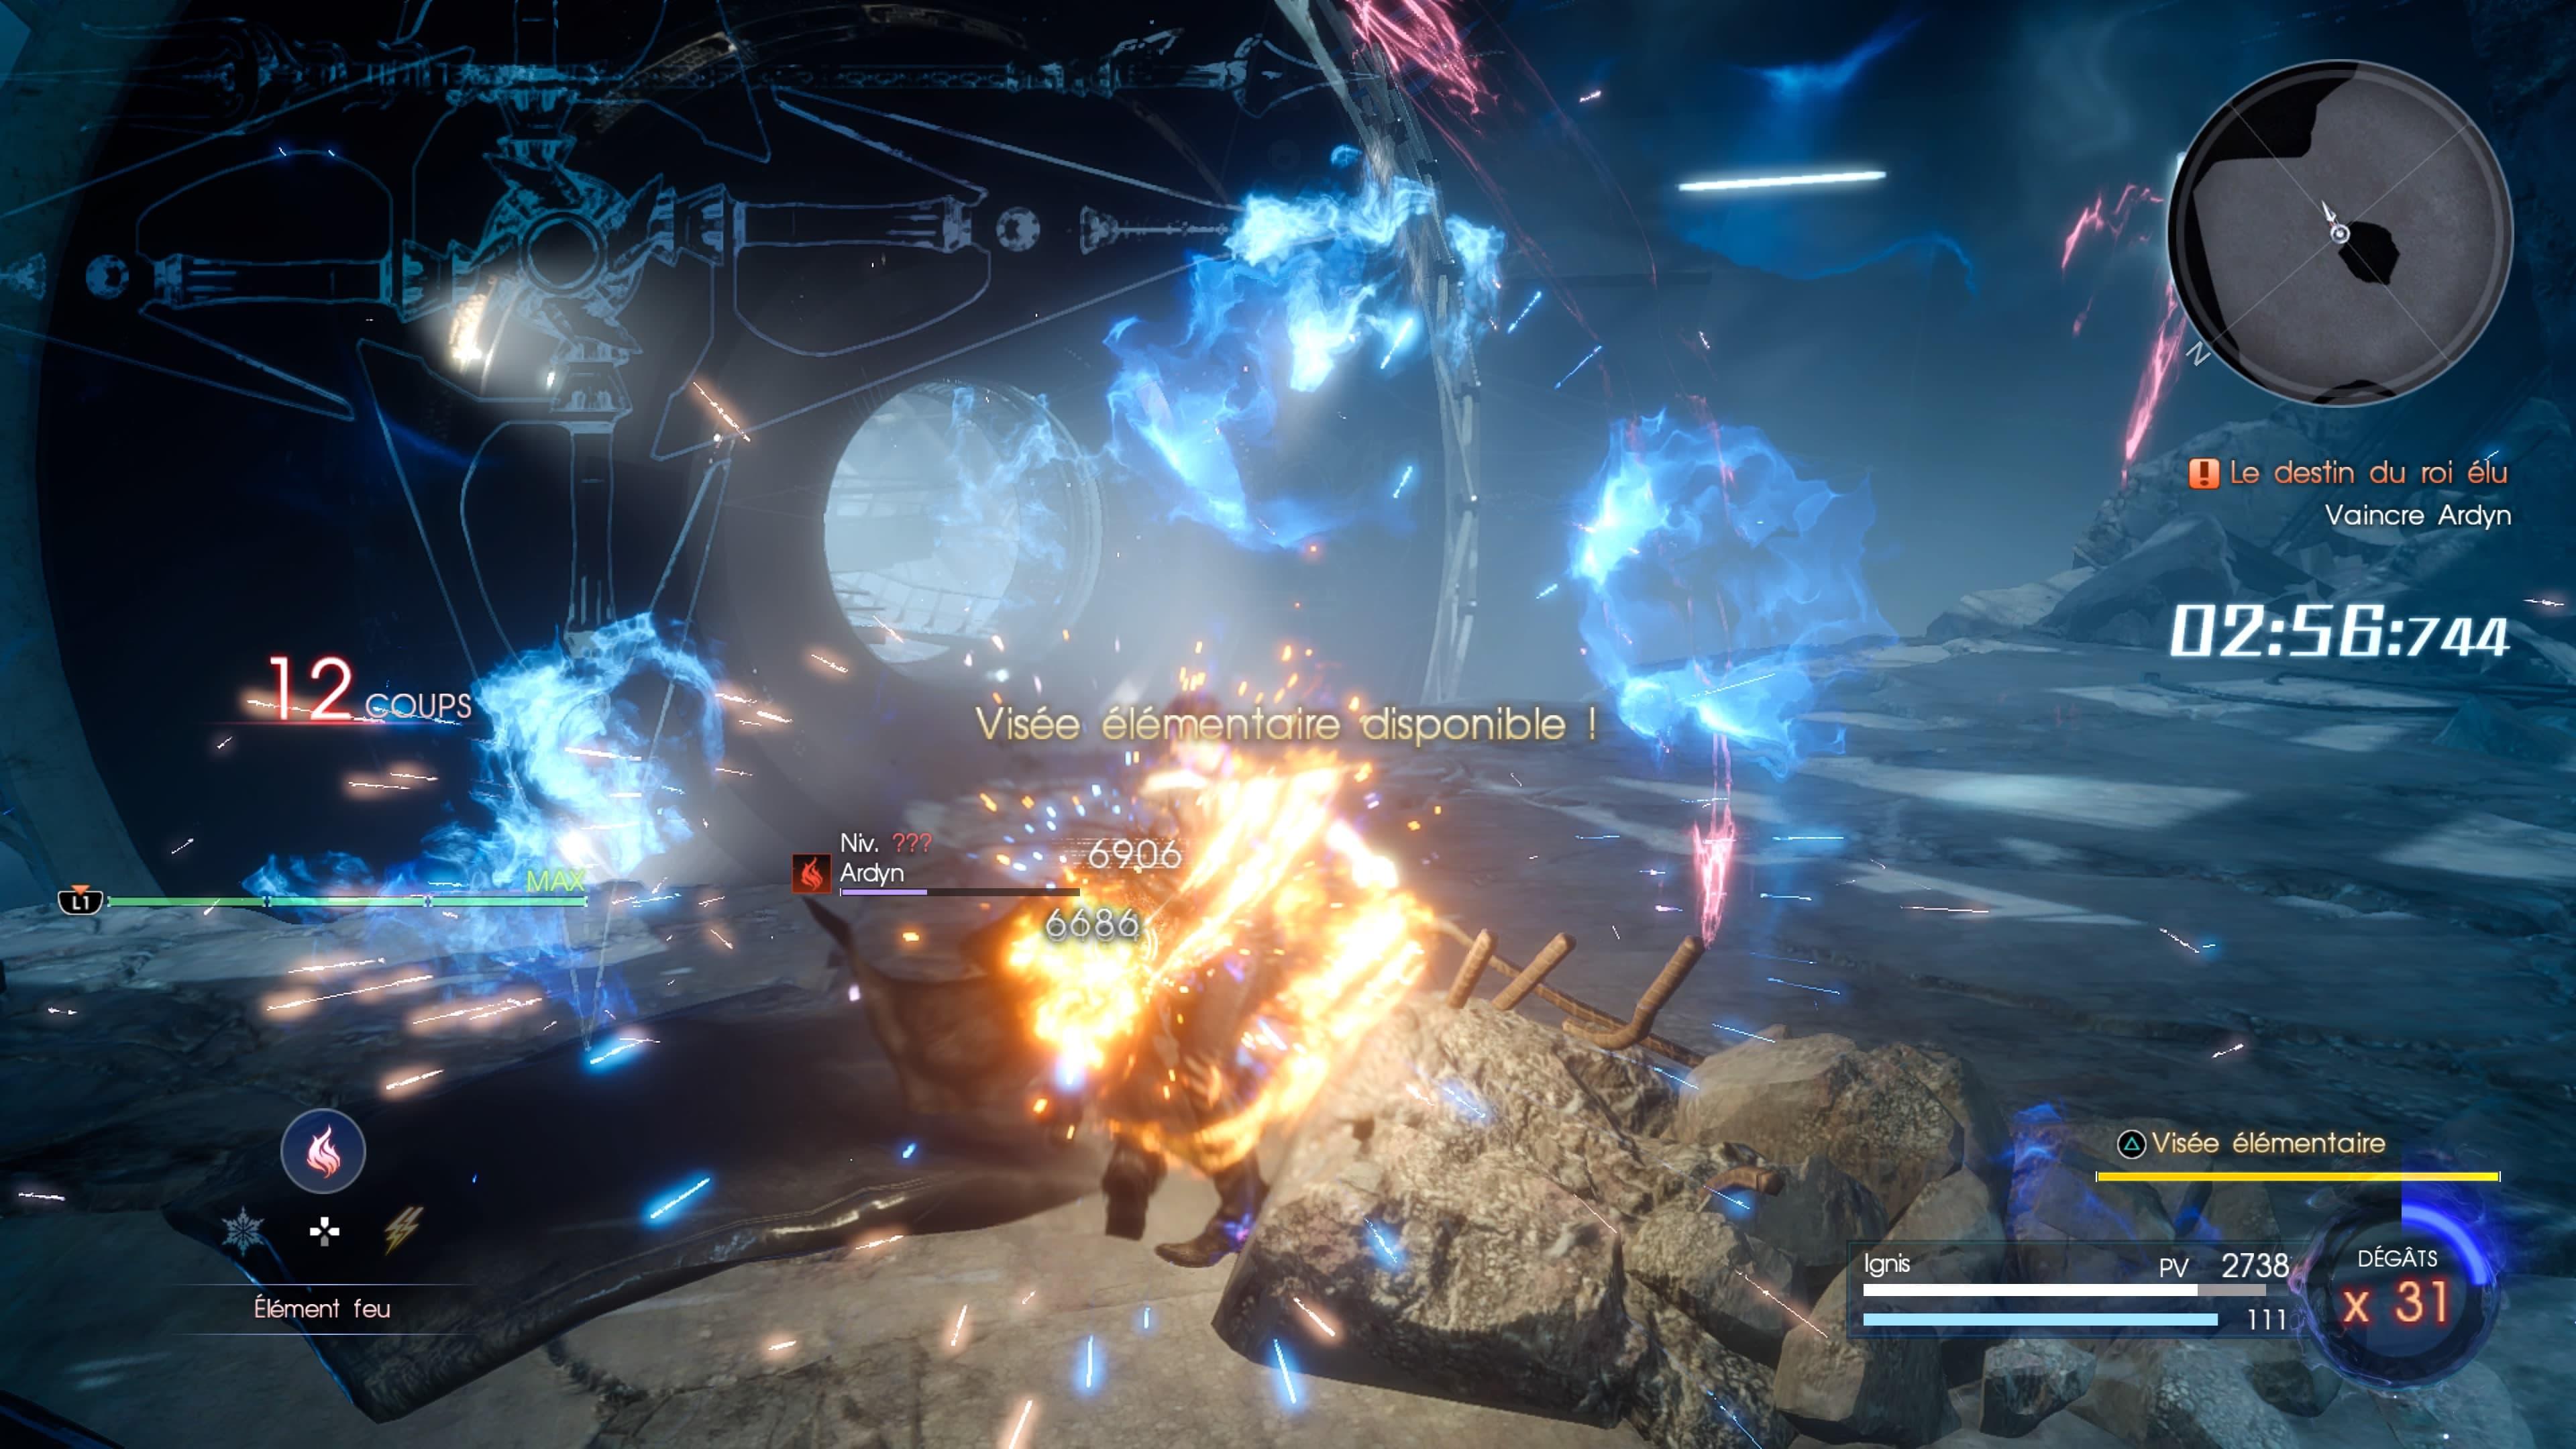 Xbox One Final Fantasy XV - Episode Ignis